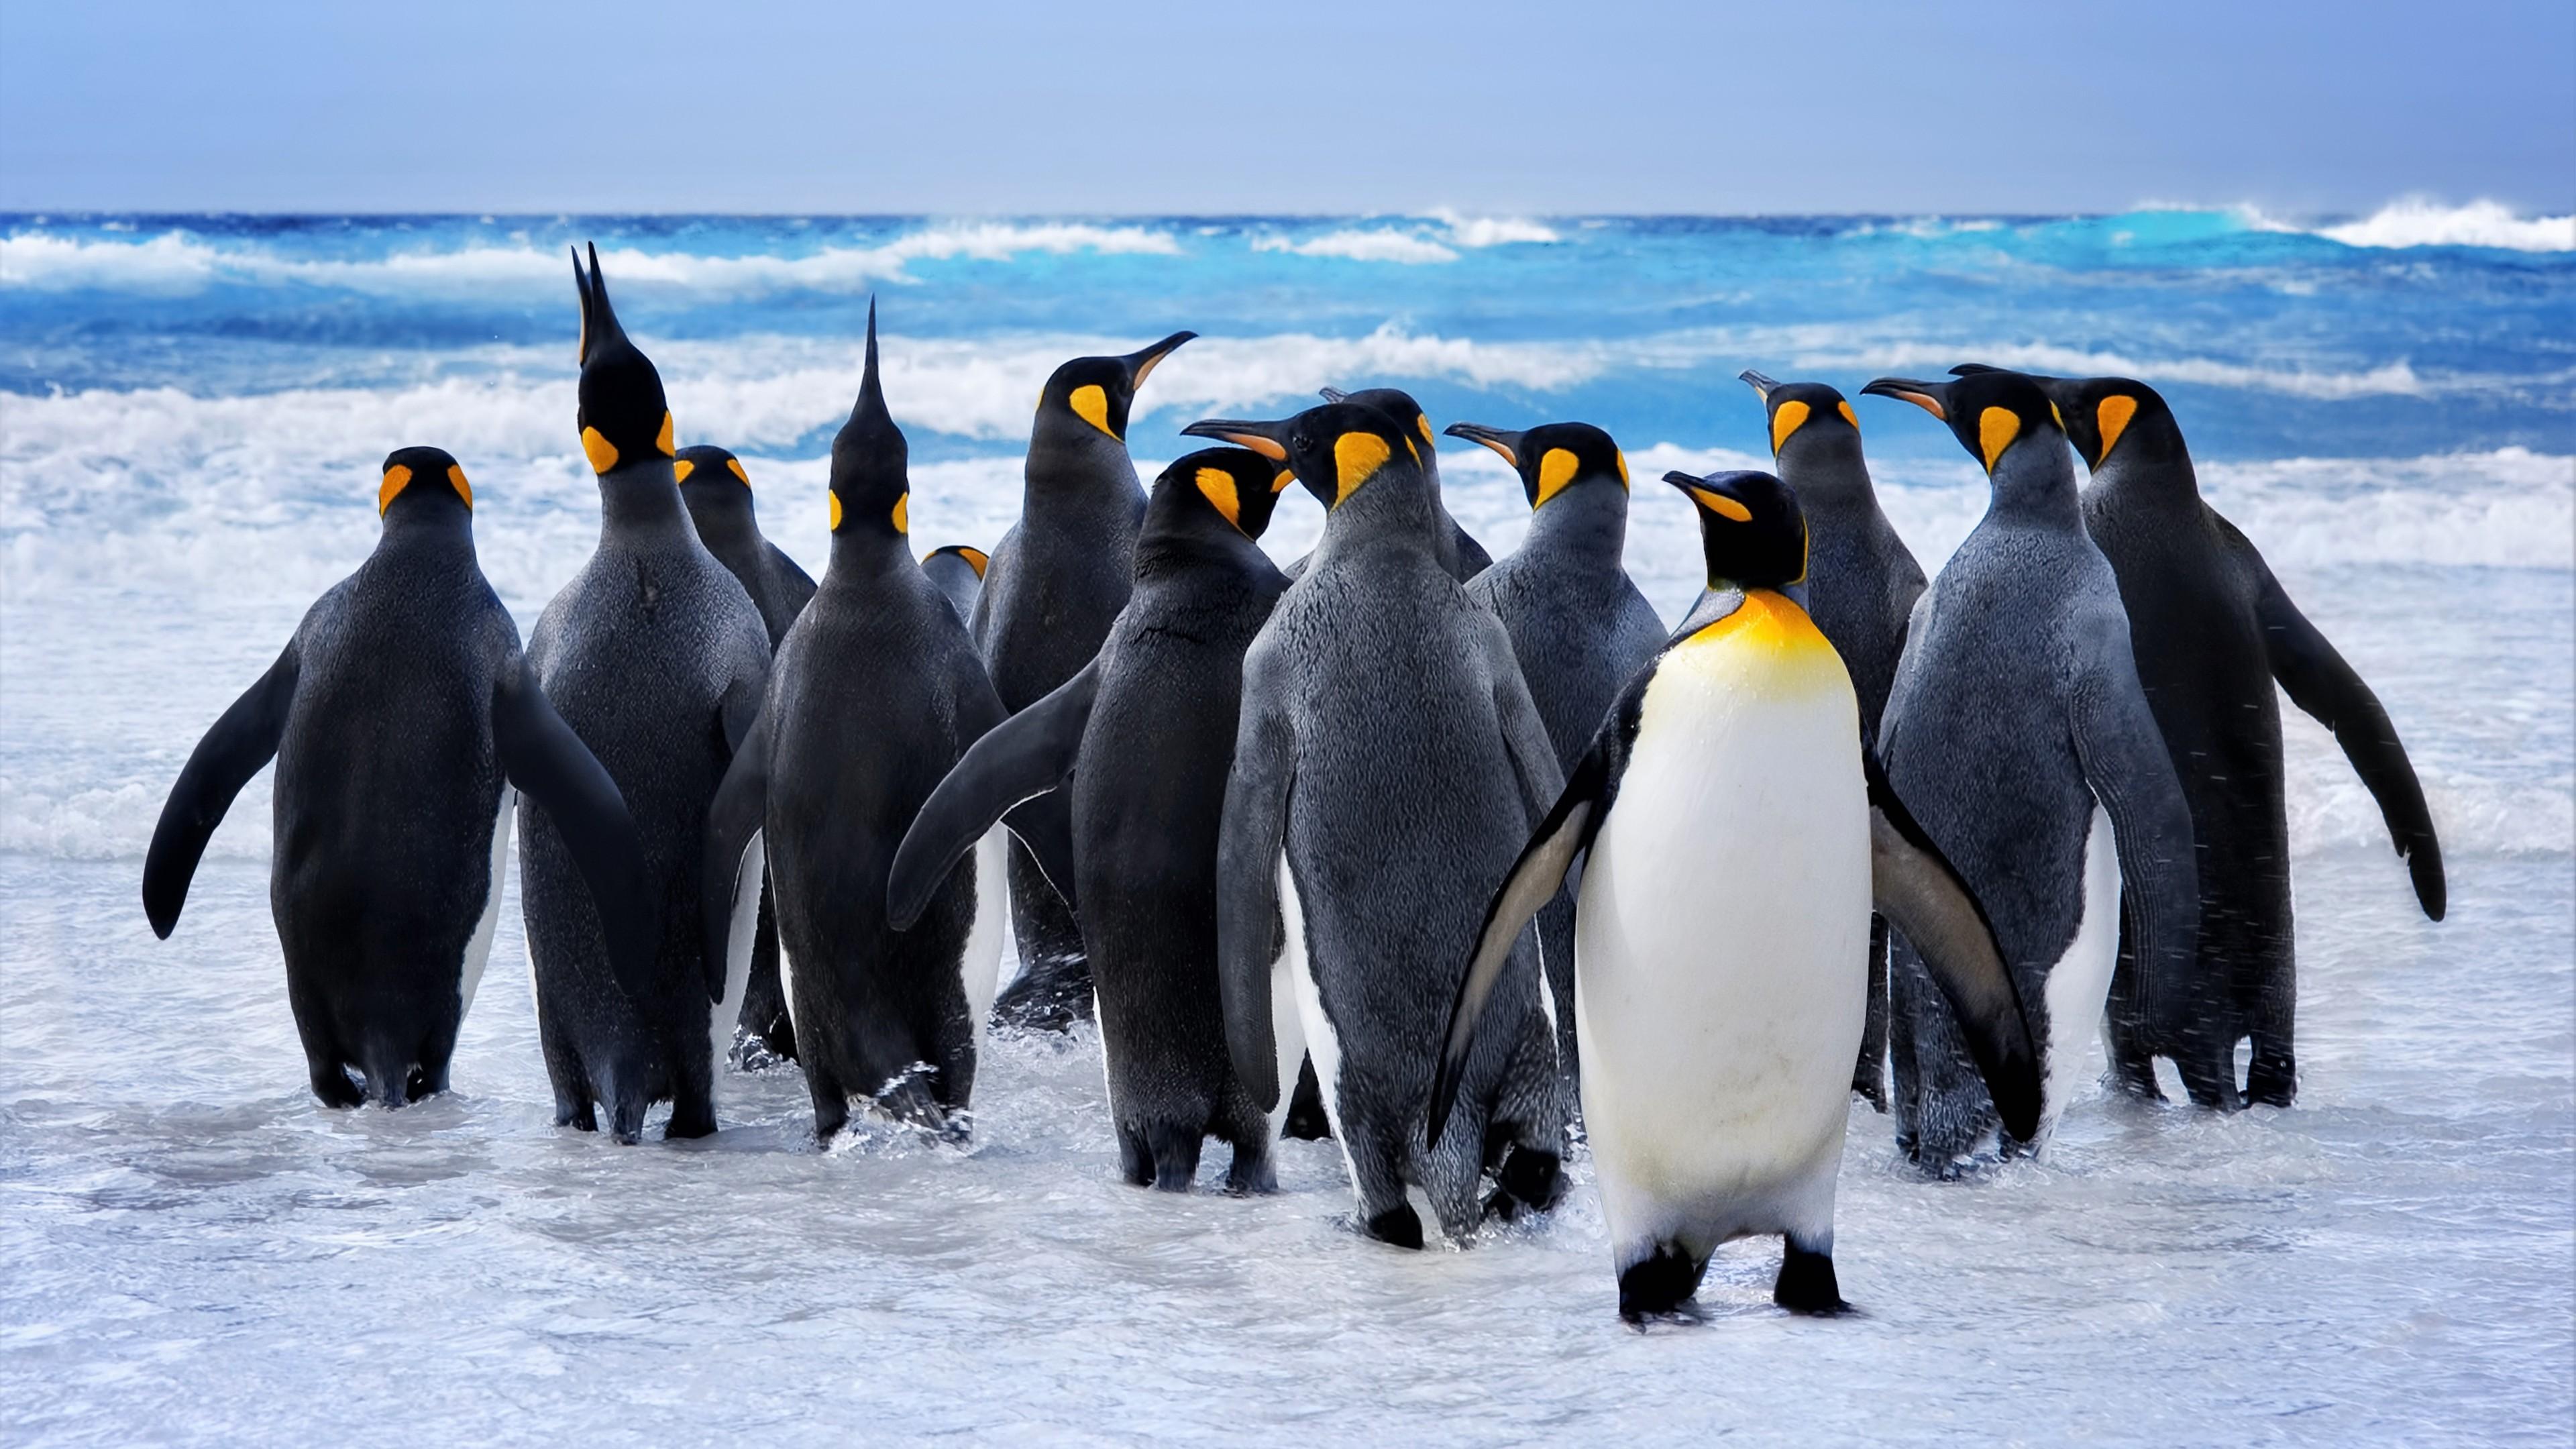 View Girl Wallpaper Wallpaper Penguins Ocean 8k Animals 17417